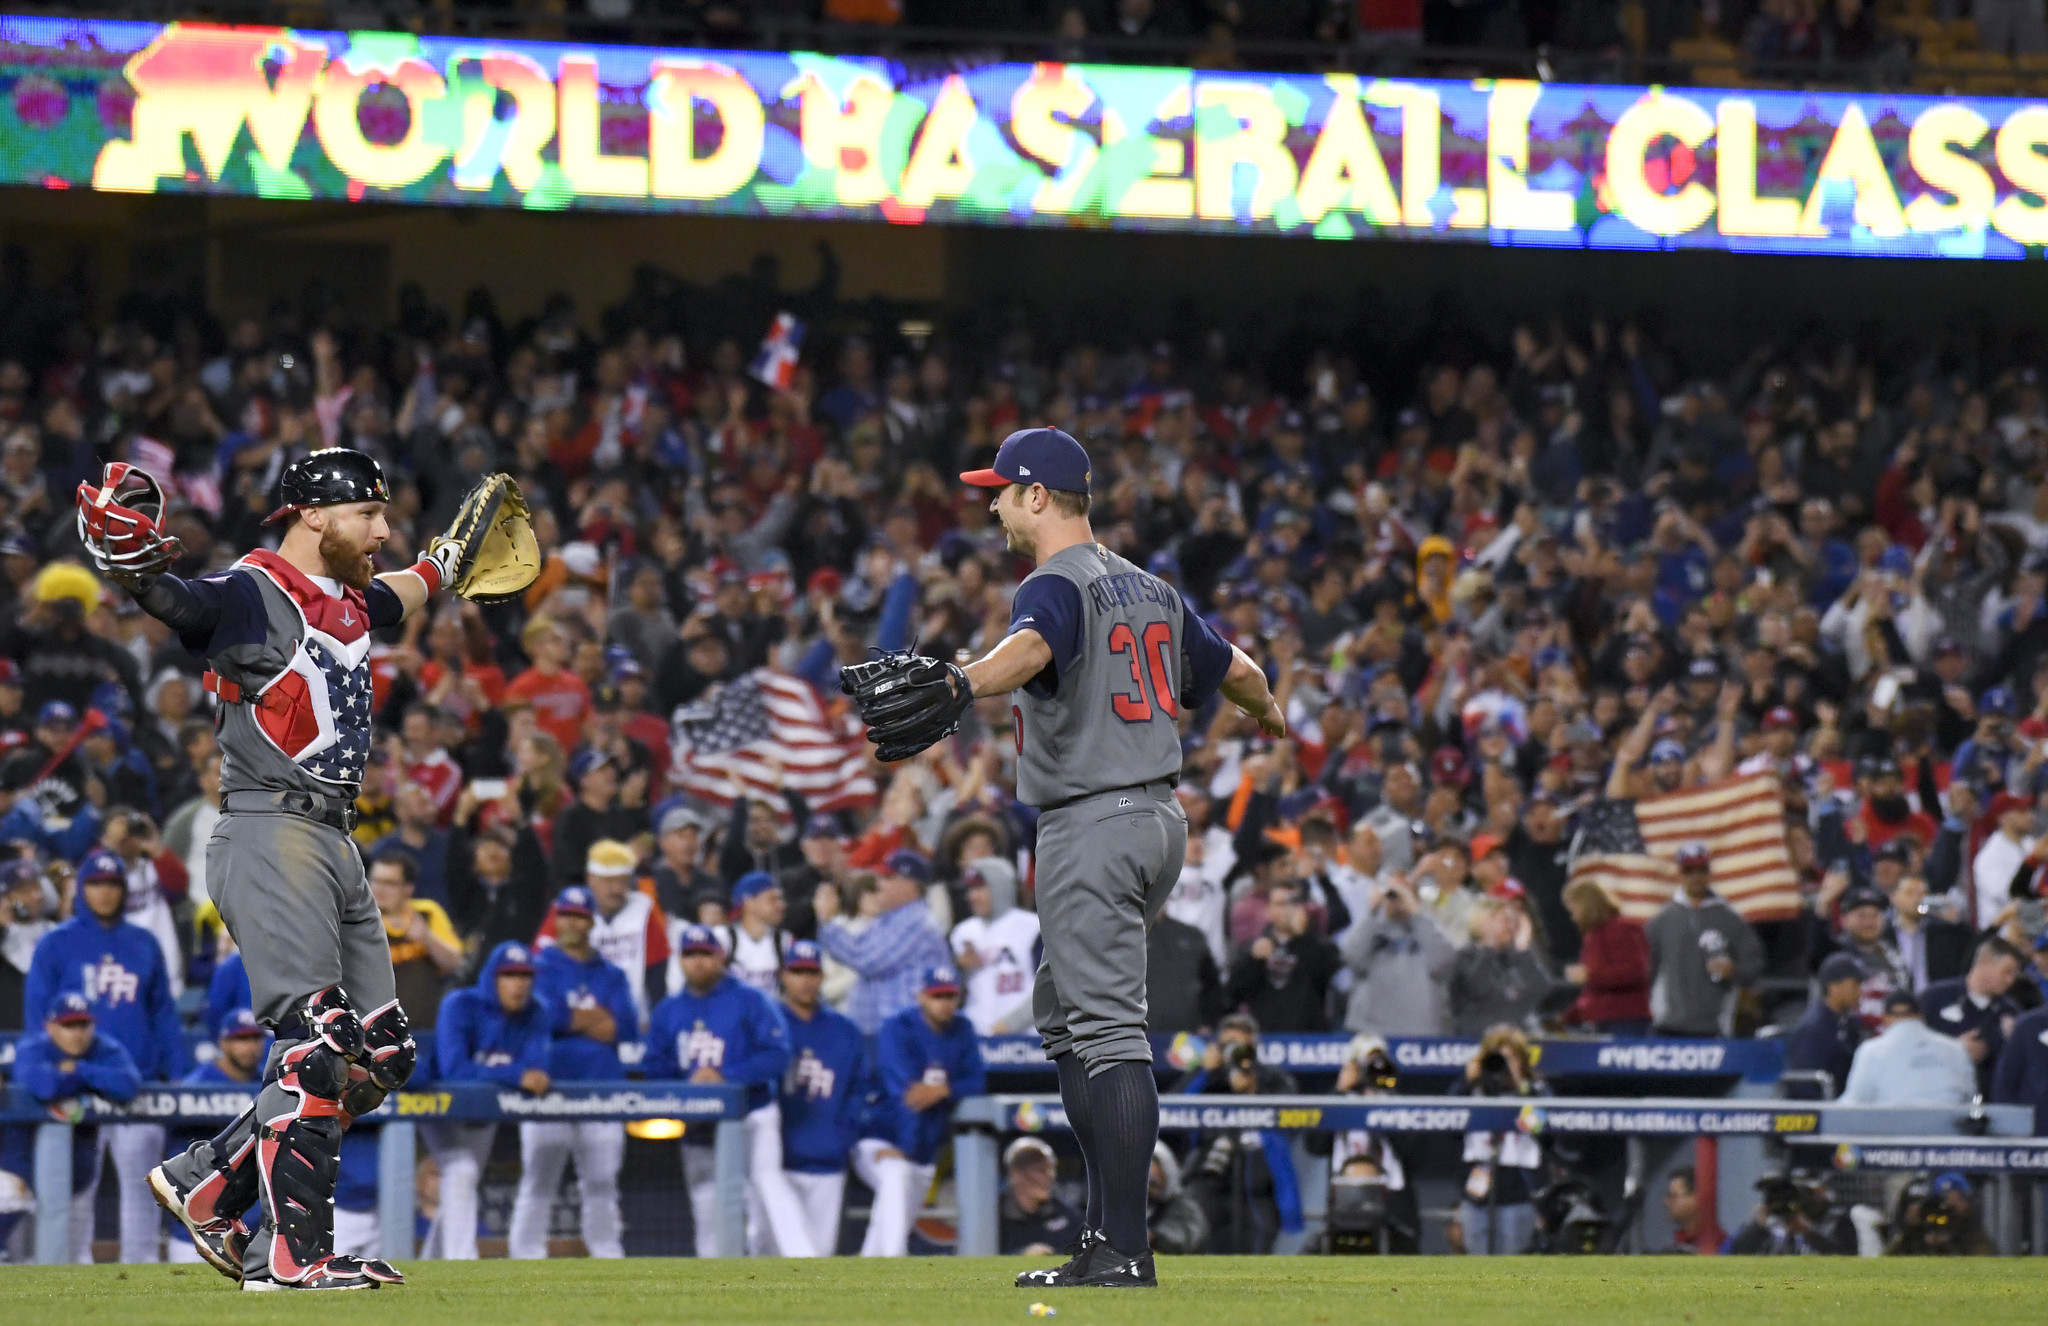 Ct-us-routs-puerto-rico-world-baseball-classic-20170323